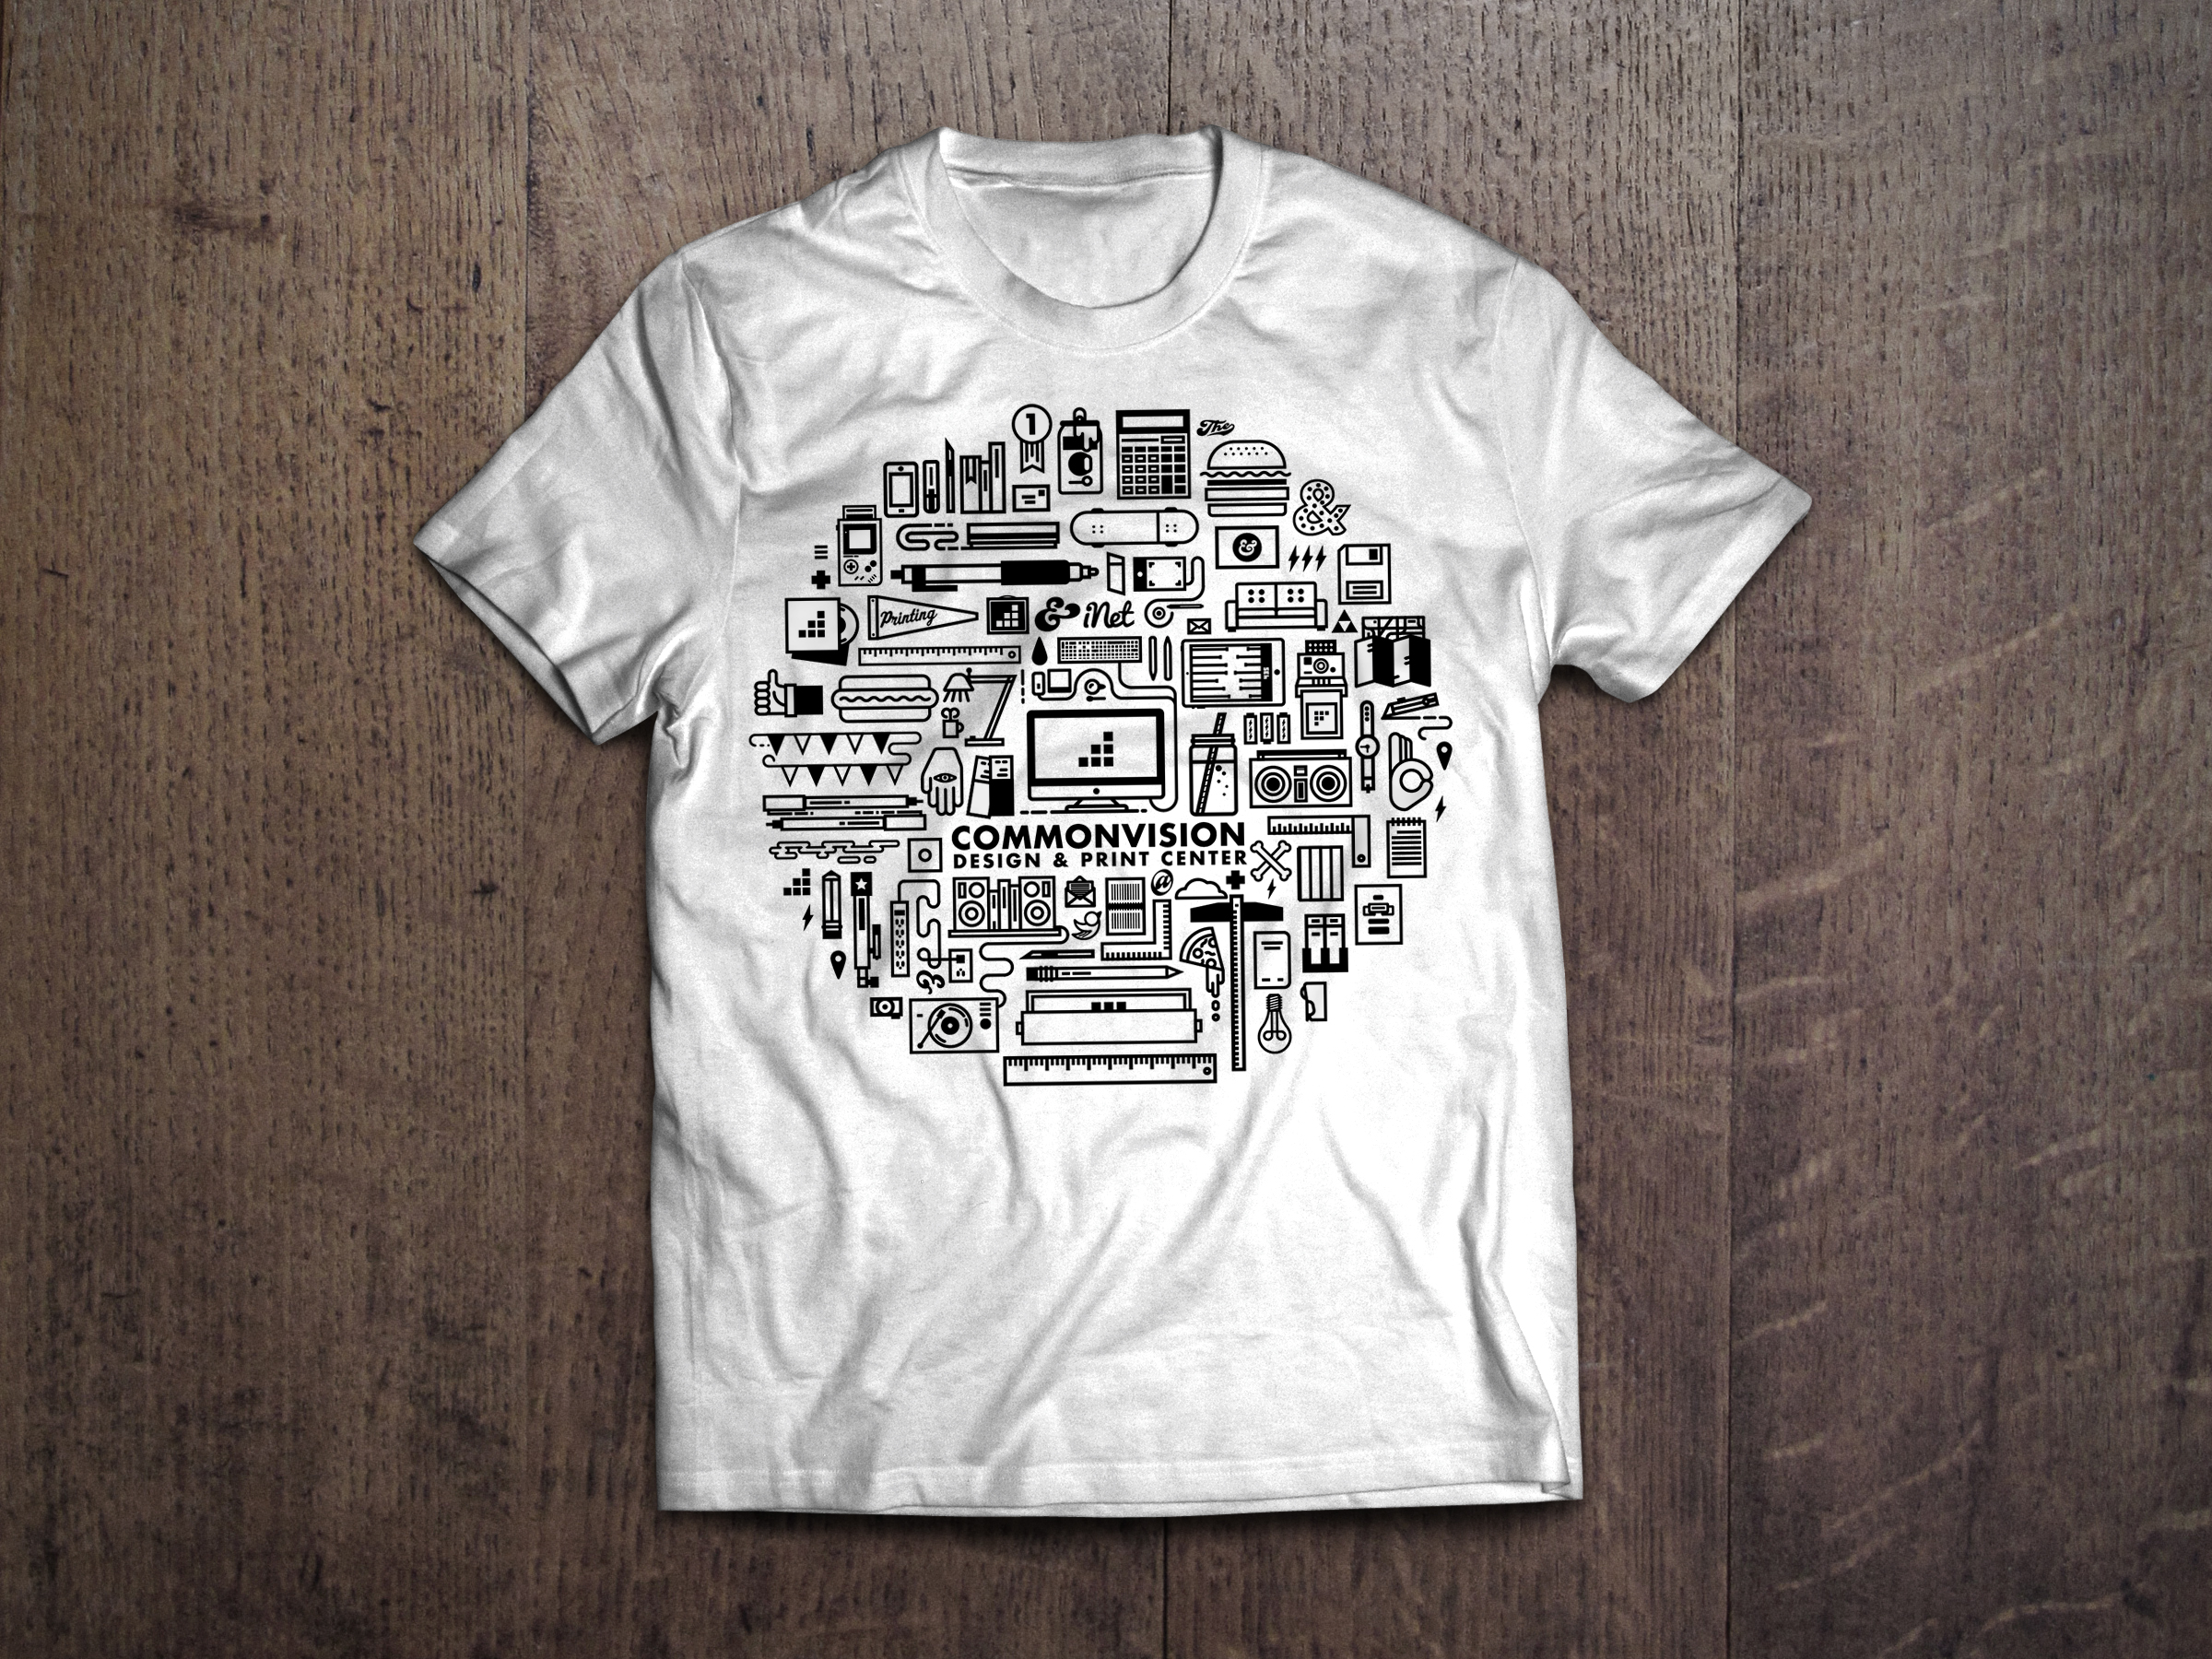 shirt-mock.jpg